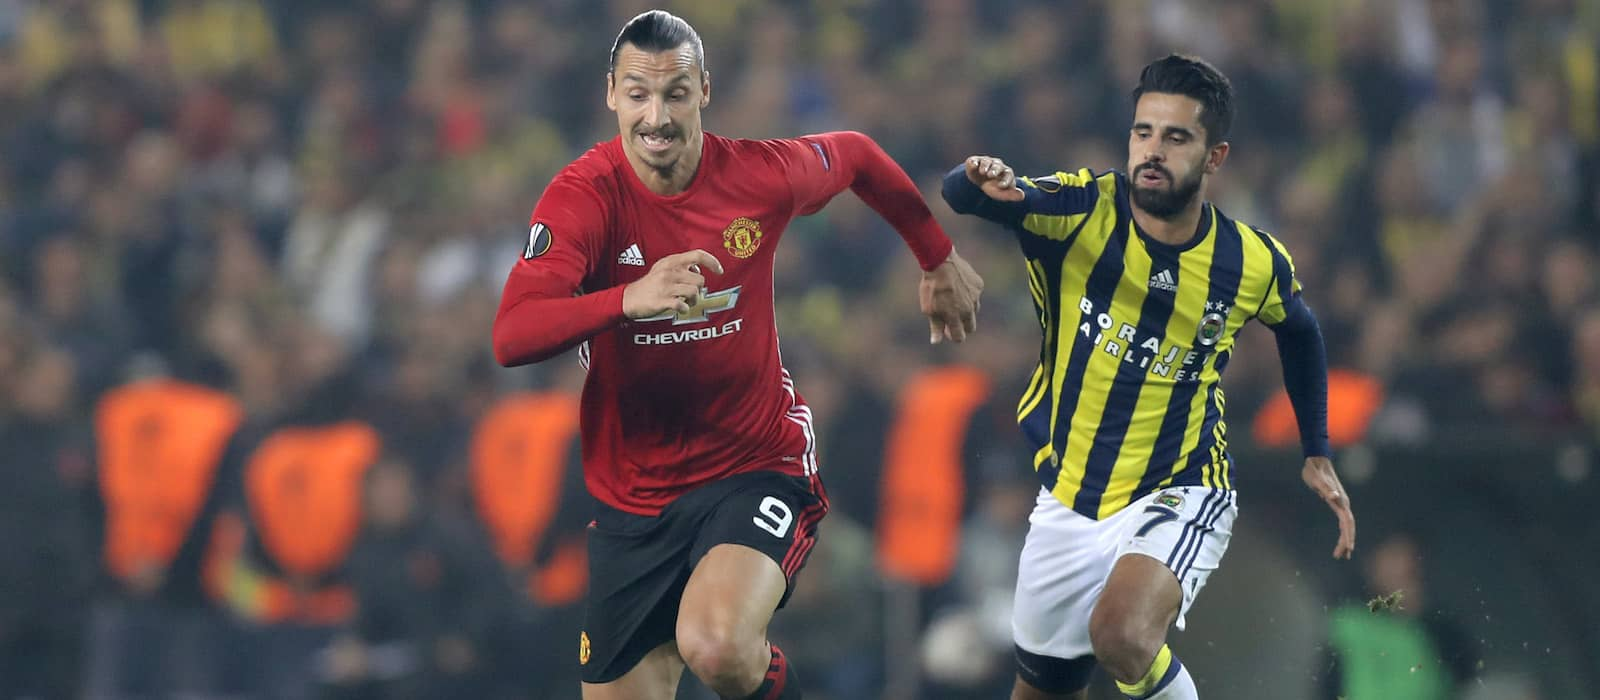 Phil Jones: Manchester United will miss Zlatan Ibrahimovic's presence